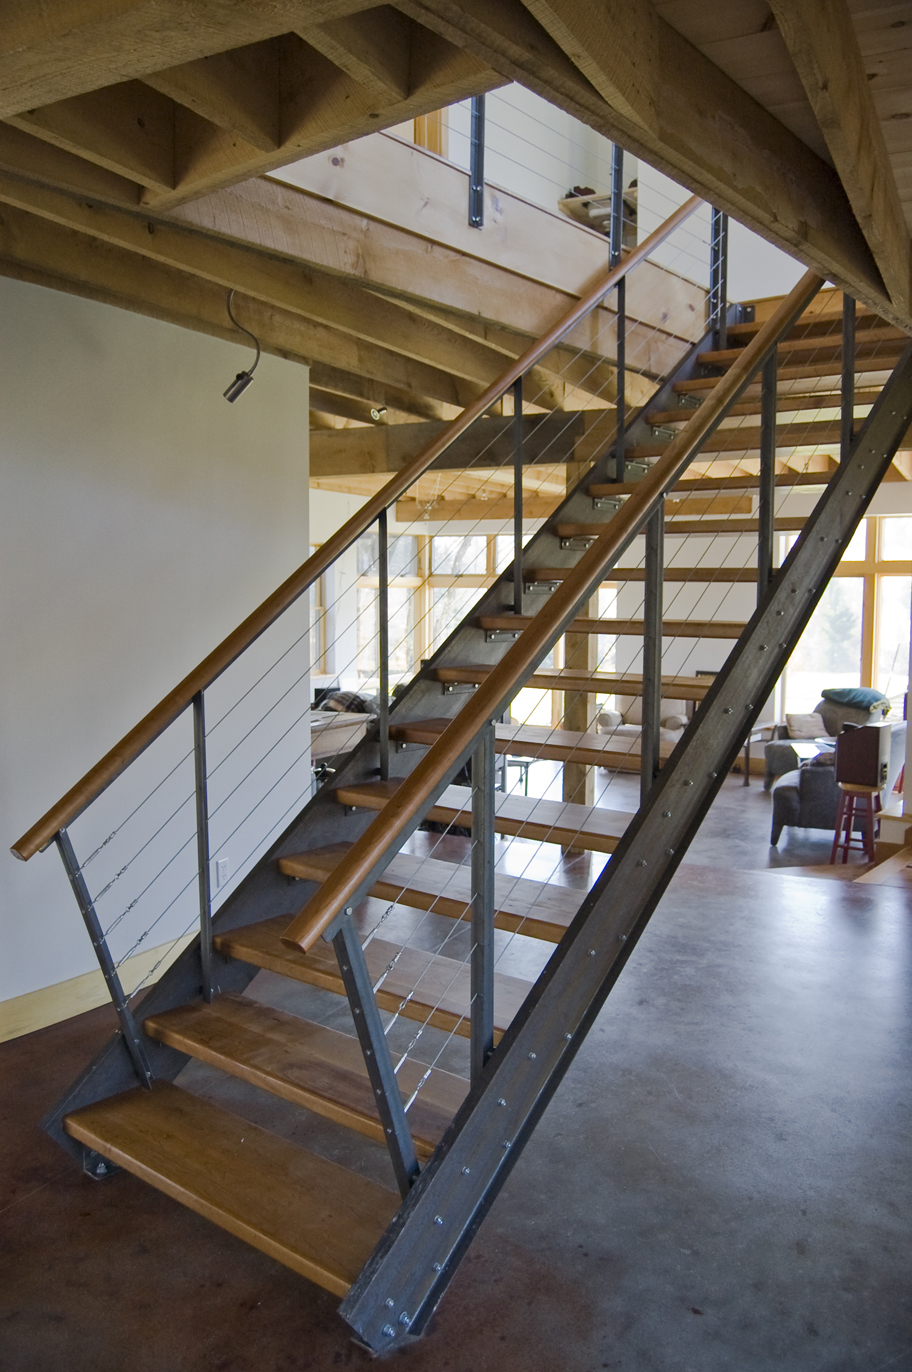 higley_stair-small.jpg